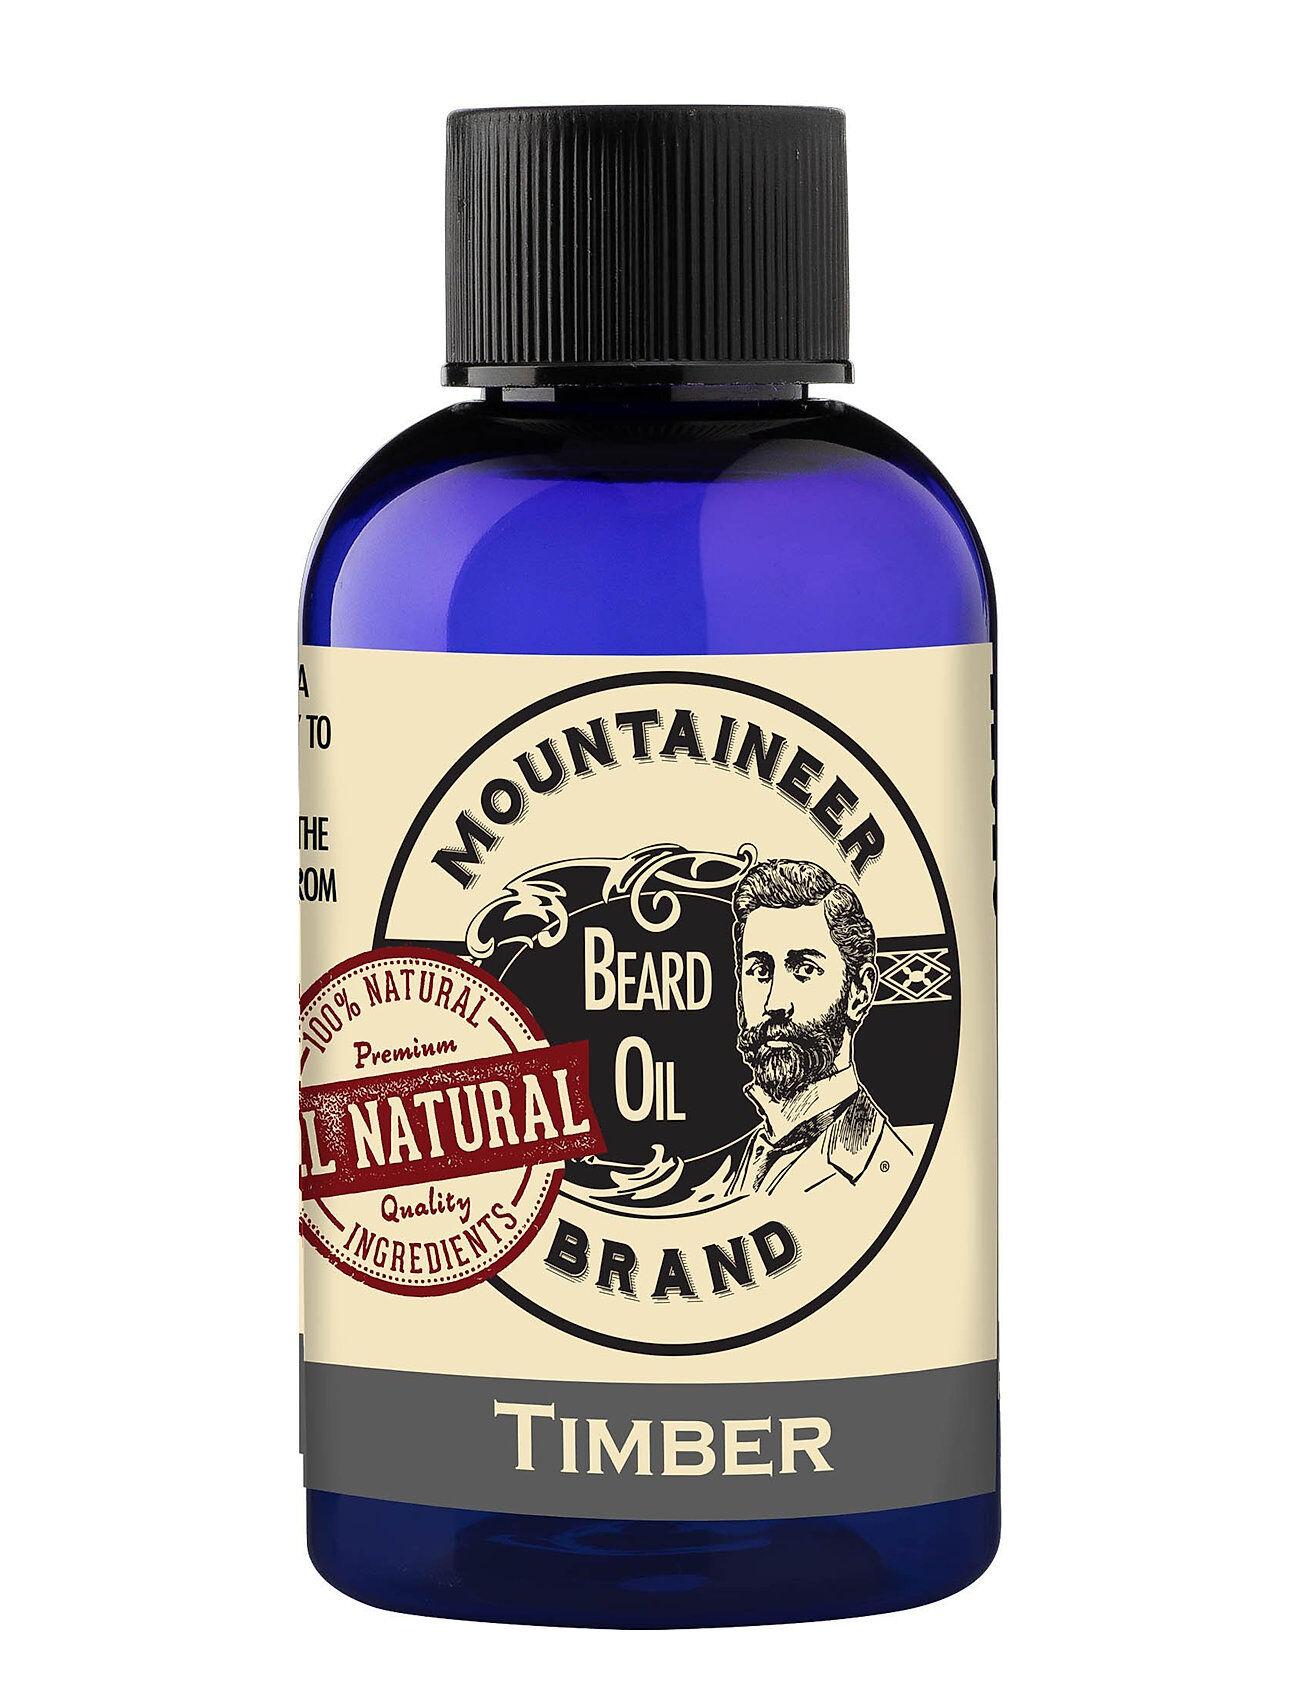 Mountaineer Brand Timber Beard Oil